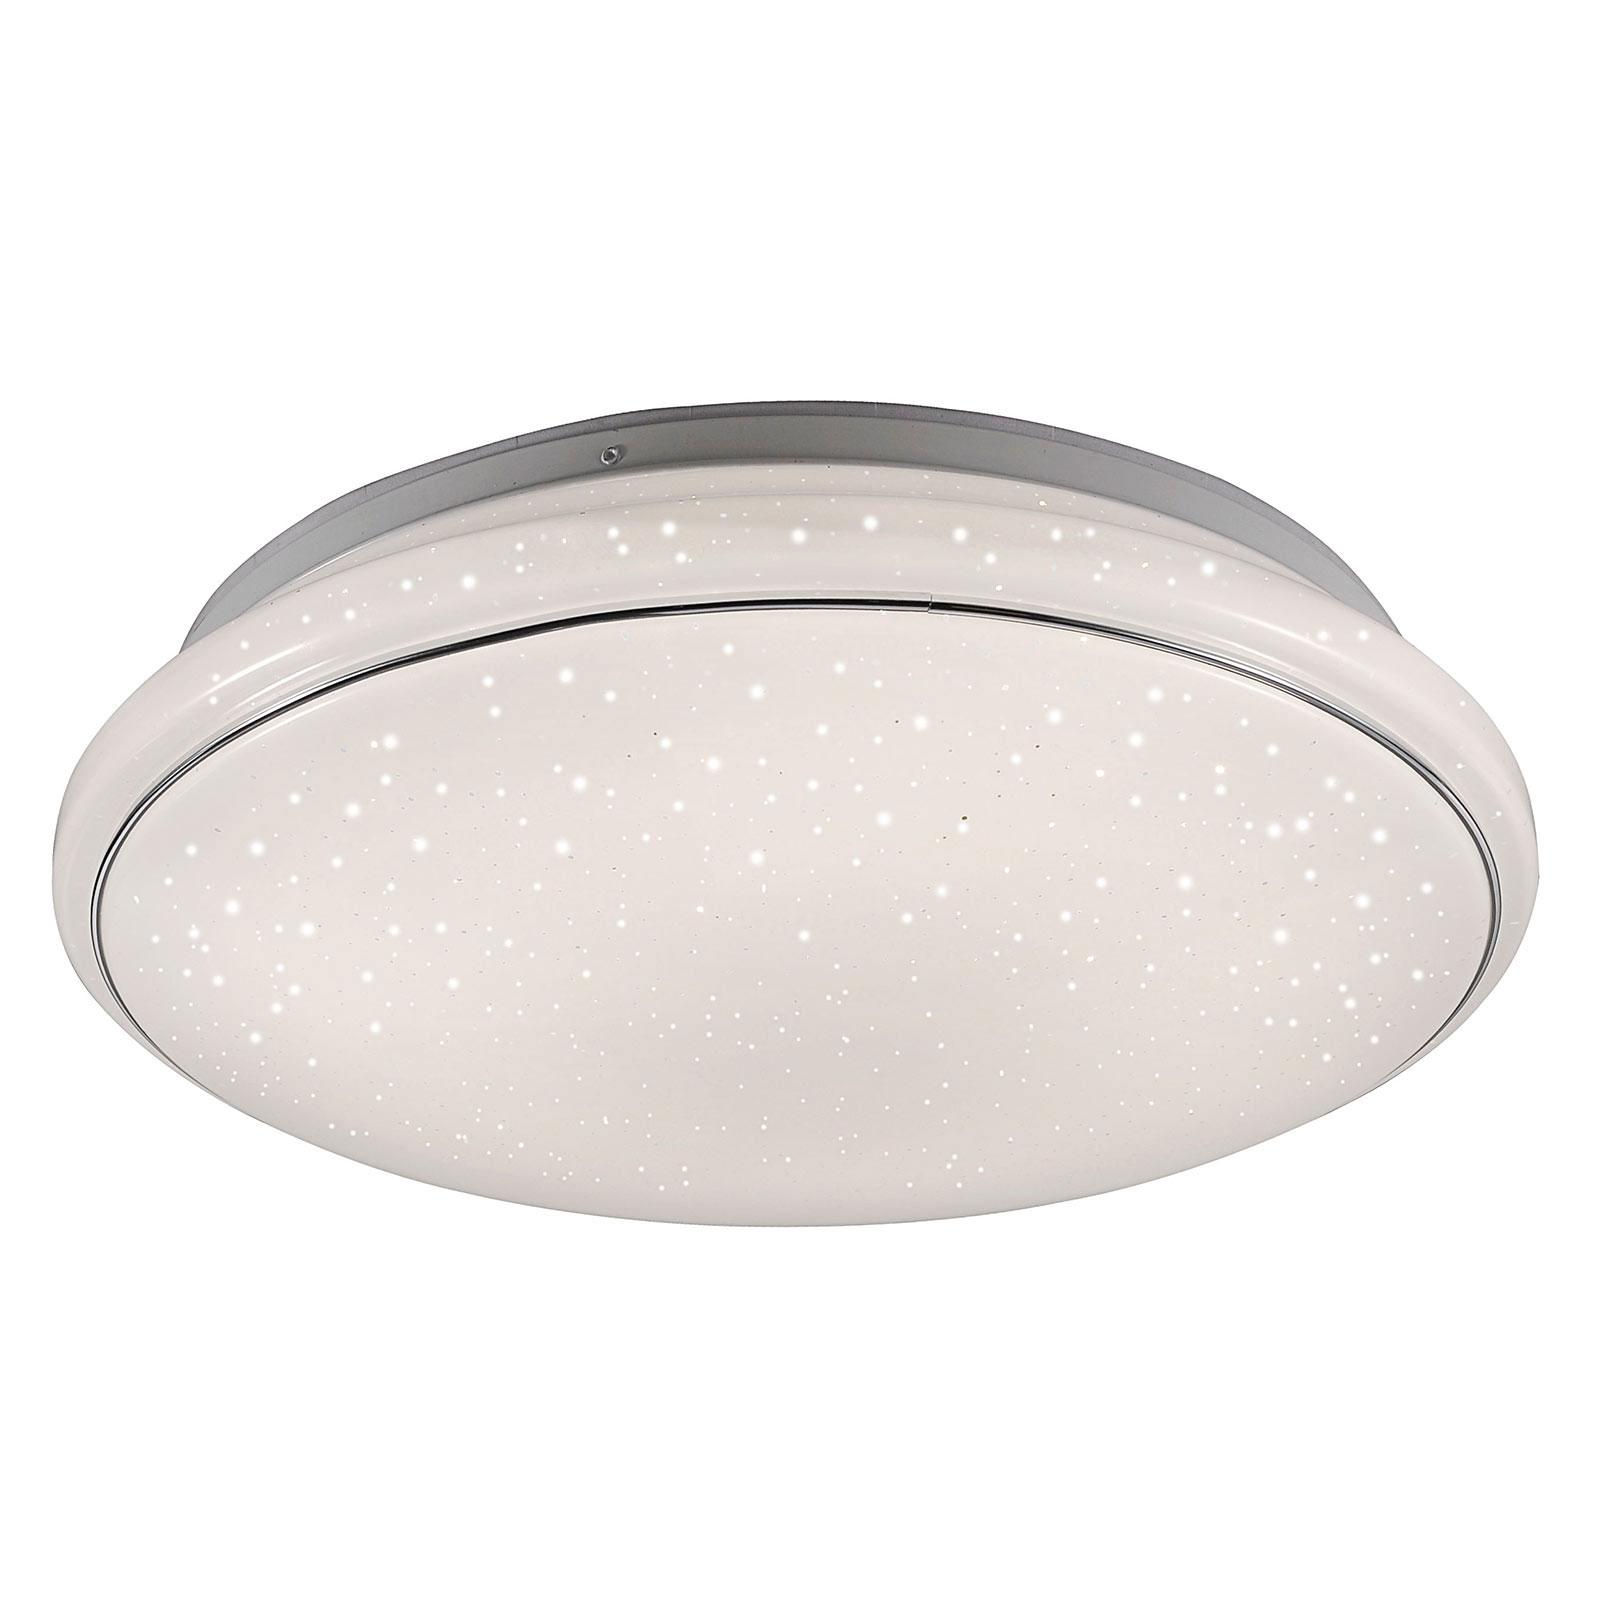 LOLAsmart Jupi LED-taklampe, Ø 59 cm